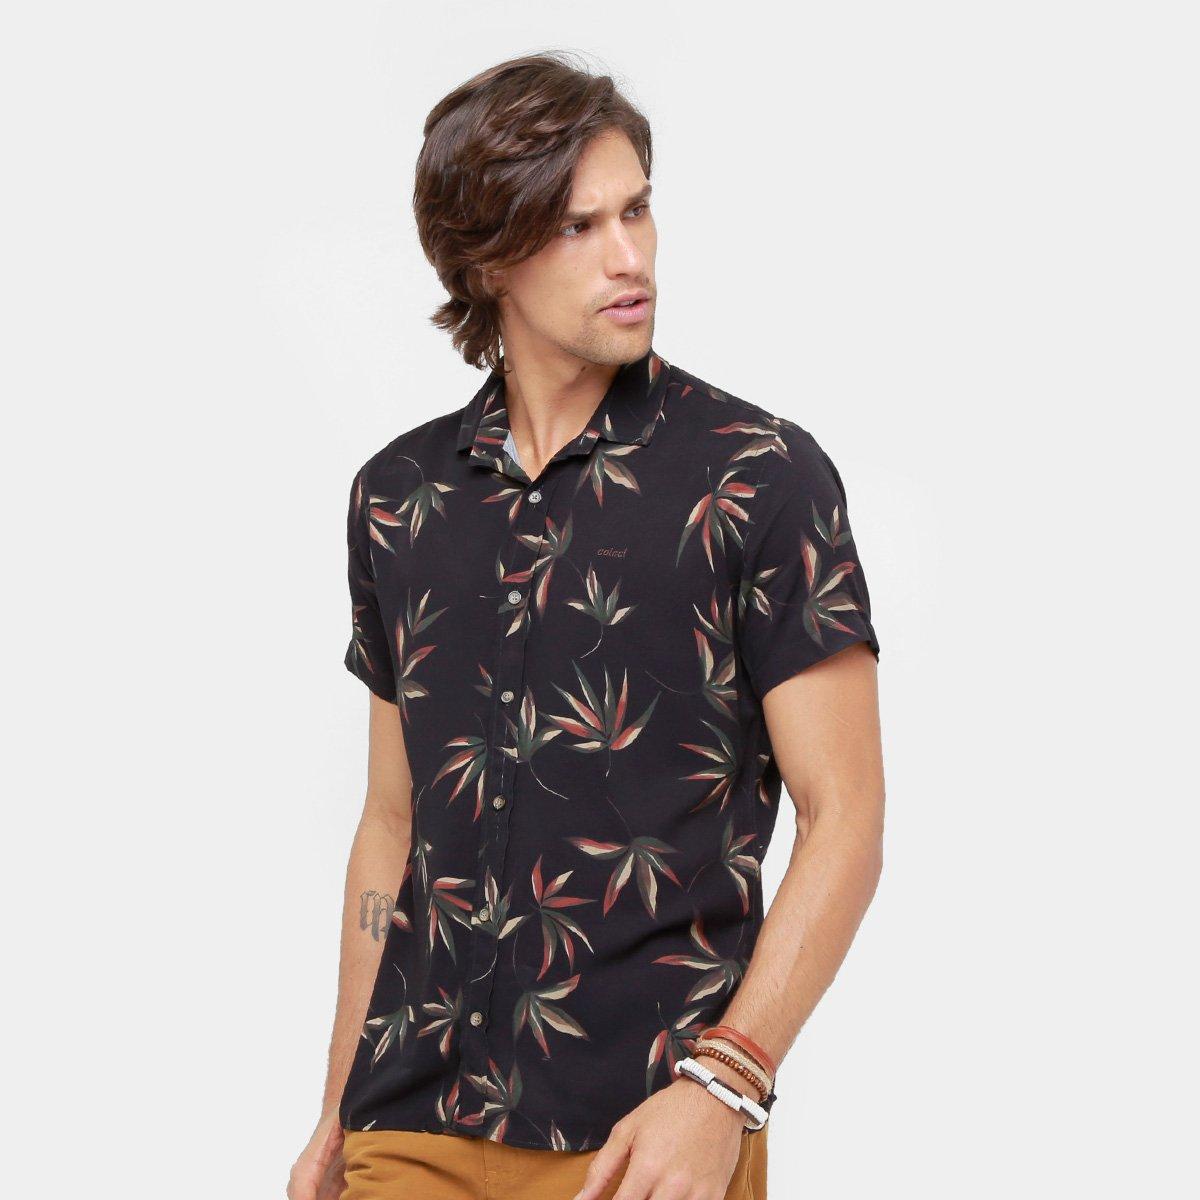 9ce07d2a9 Camisa Colcci Folhas Masculina - Compre Agora